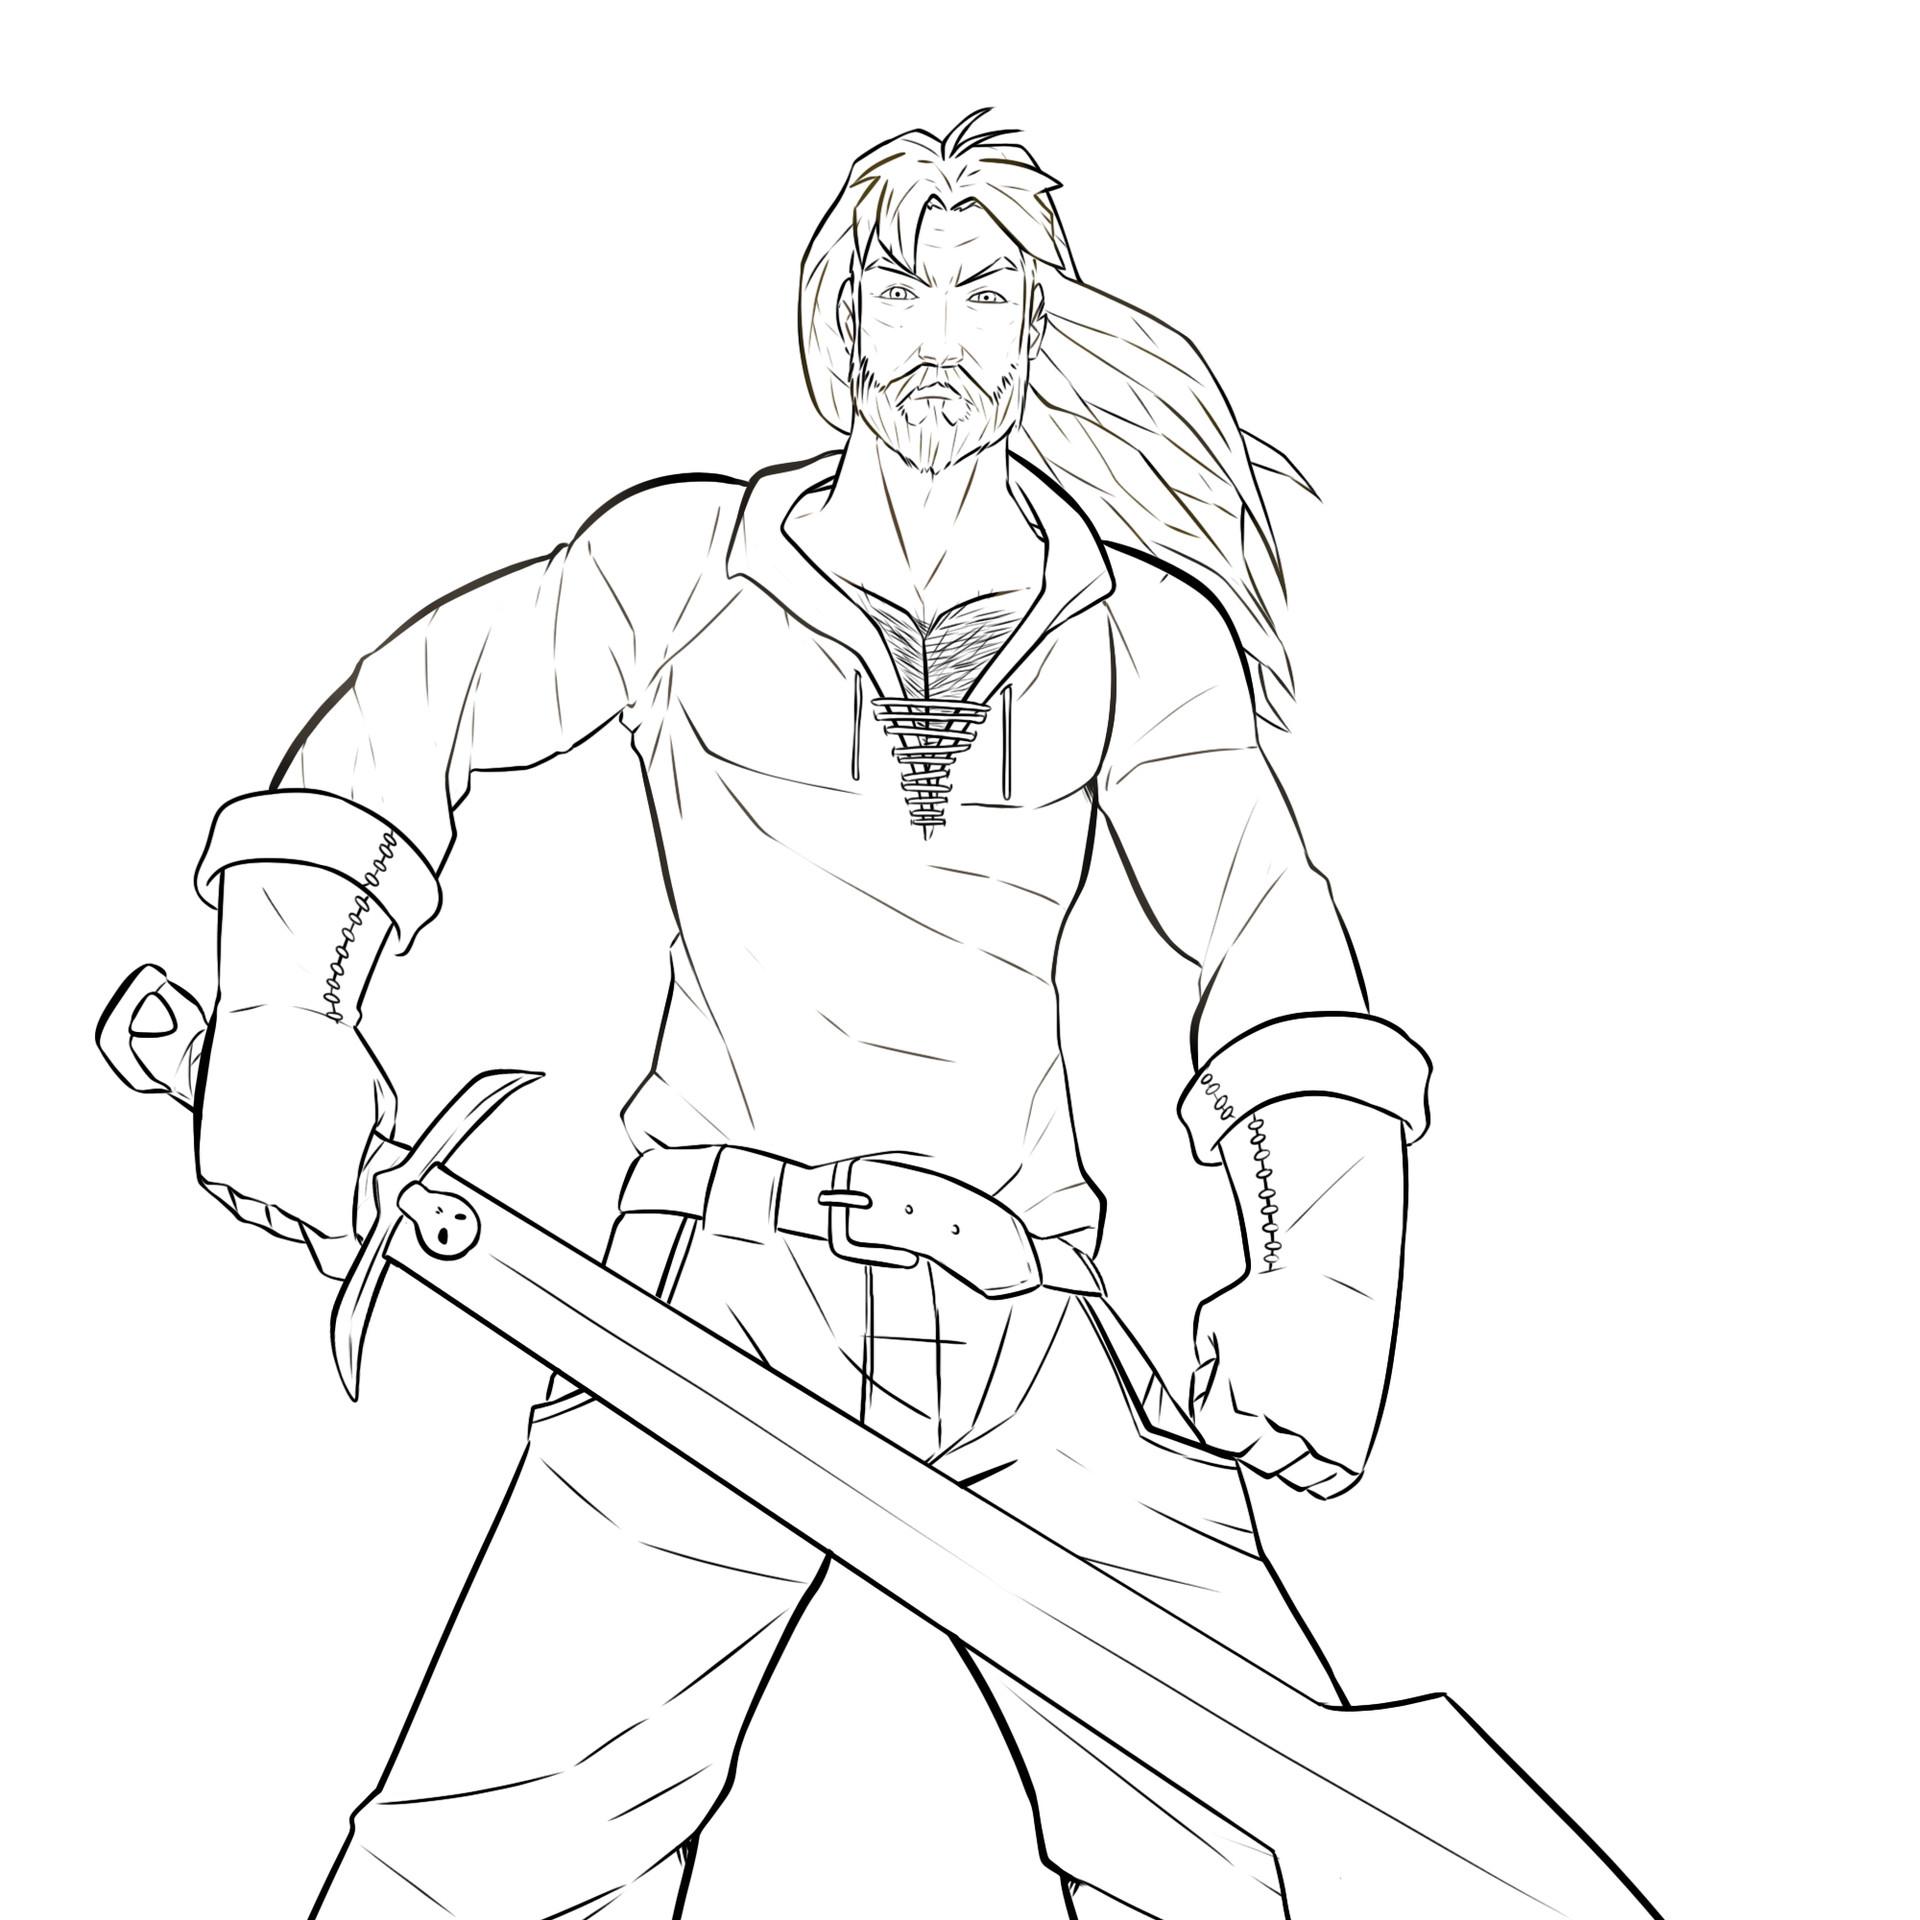 Xion mart guerrero 1